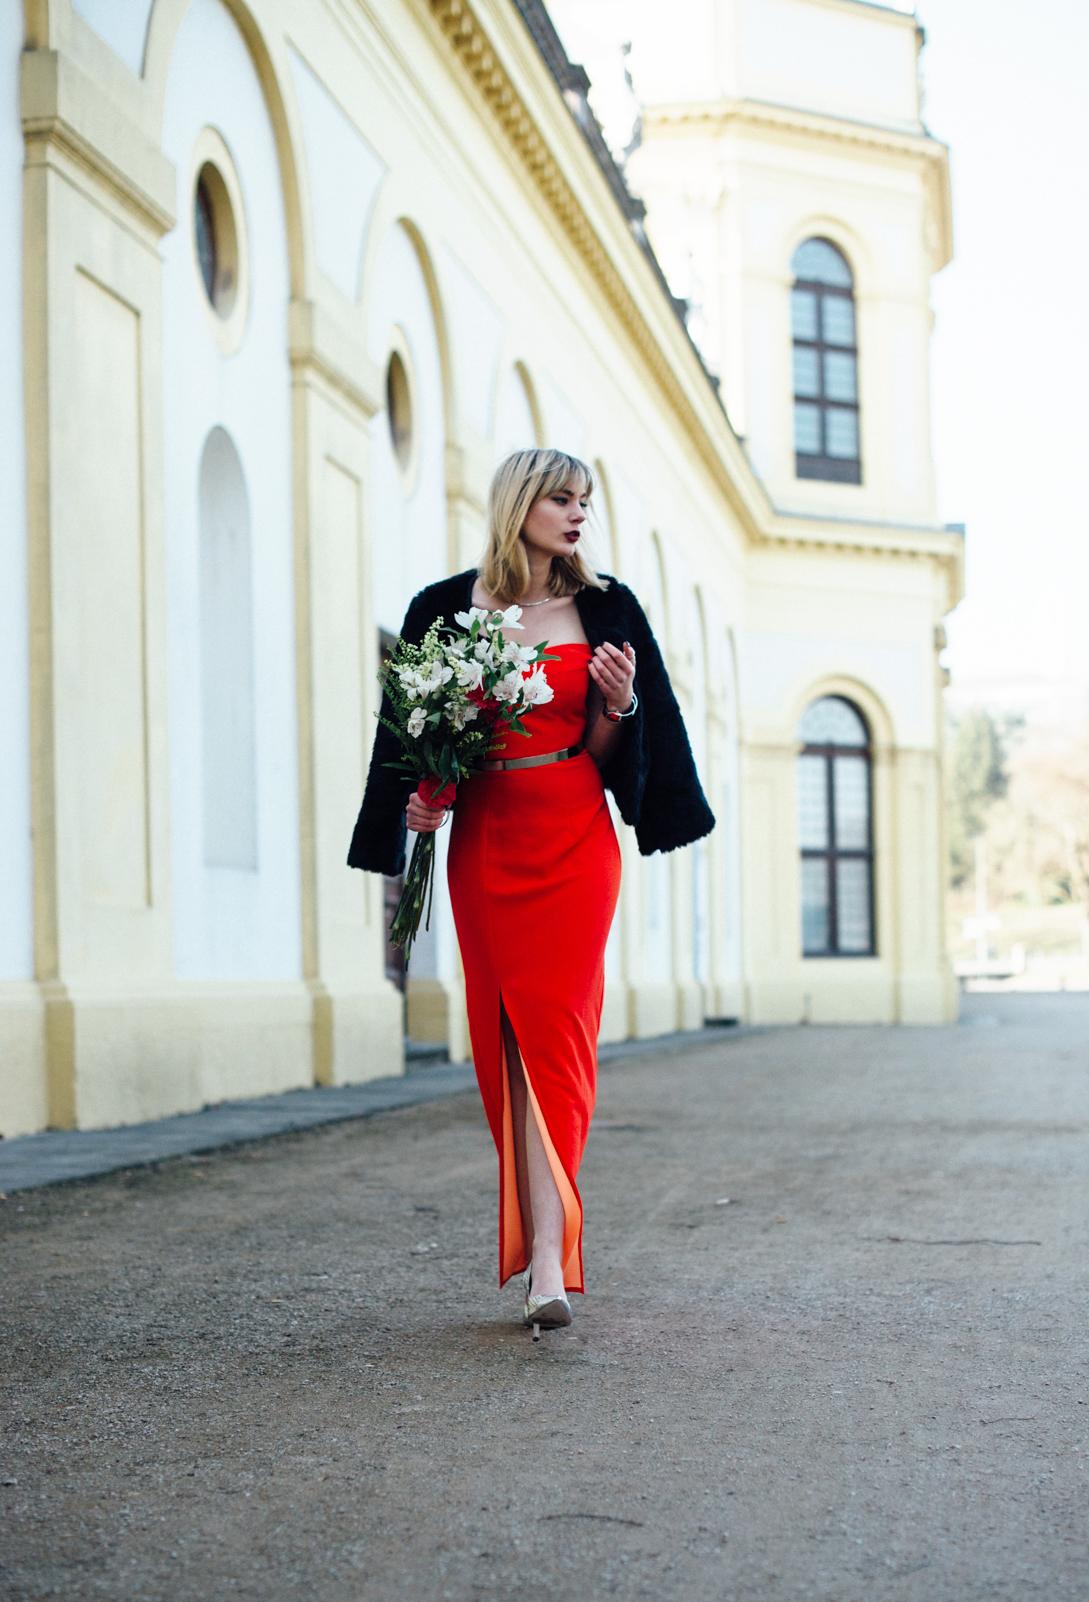 Kiamisu_Modeblog_Fashionblog_divodress_Abendkleid rot_mybloomydays_bouquet_Abendmode-14_heller